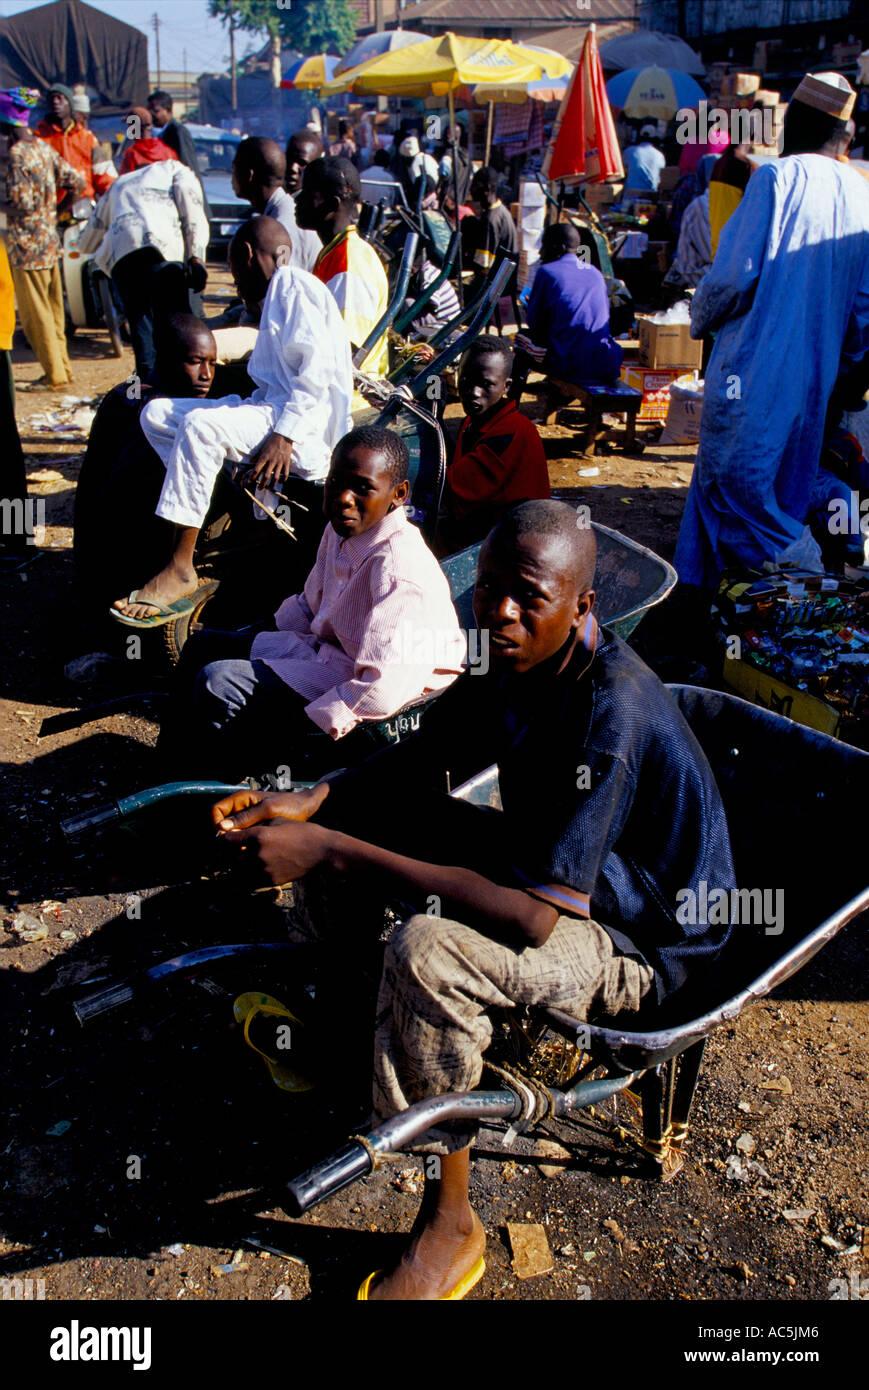 LAGOS MARKET NIGERIA 2001 2001 - Stock Image